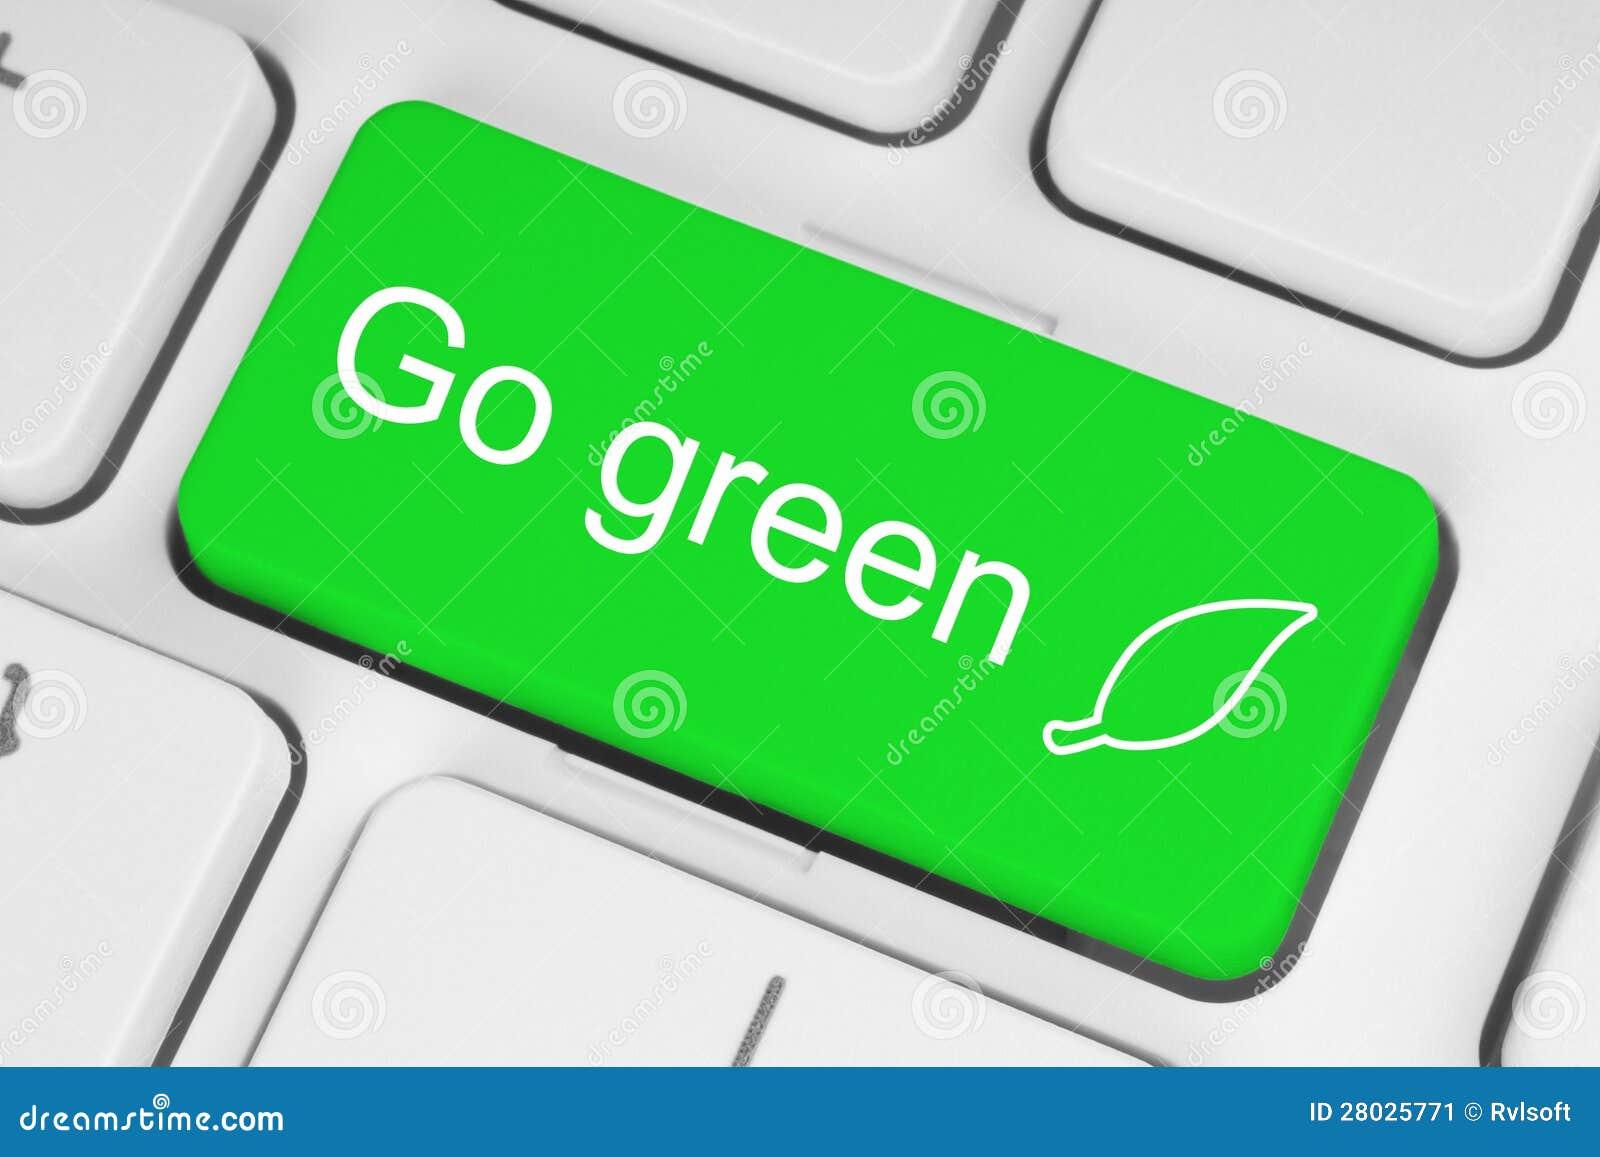 Best Green Go Sign #19859 - Clipartion.com